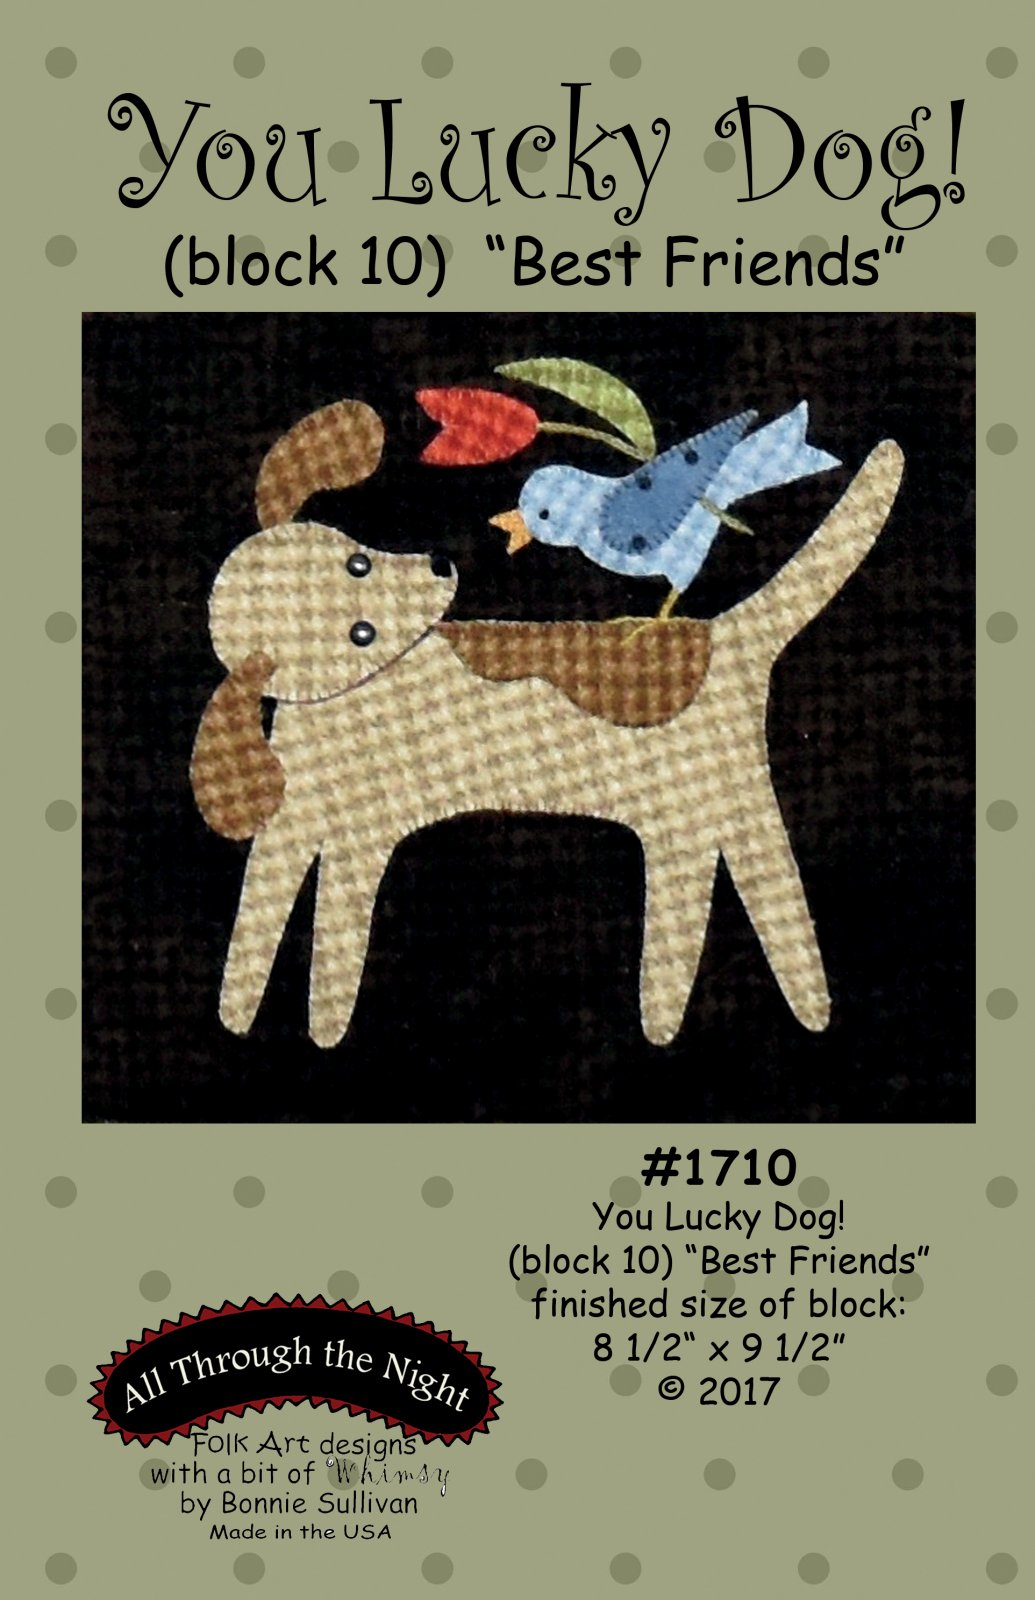 1710 You Lucky Dog Best Friends